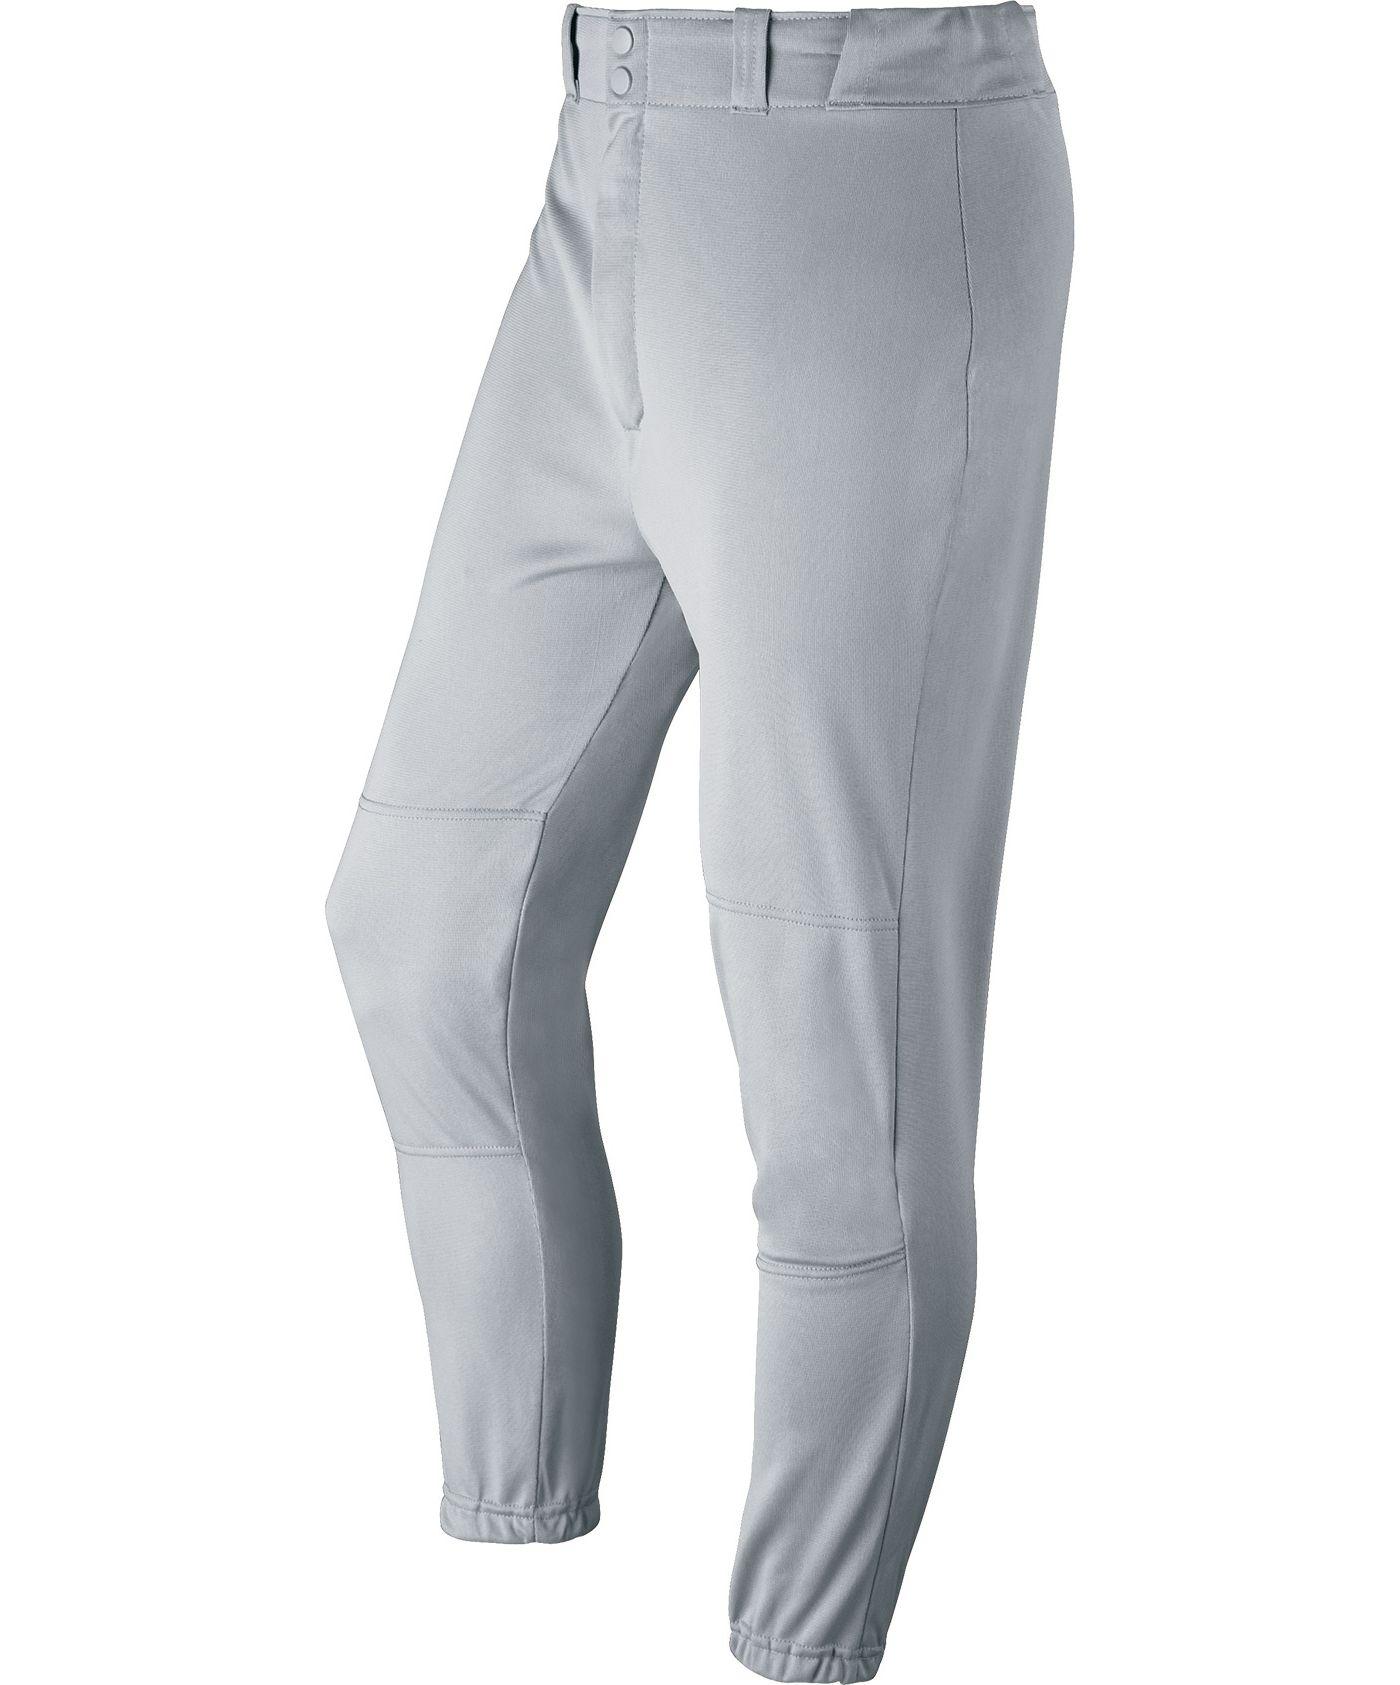 Wilson Boys' Classic Fit Baseball Pants